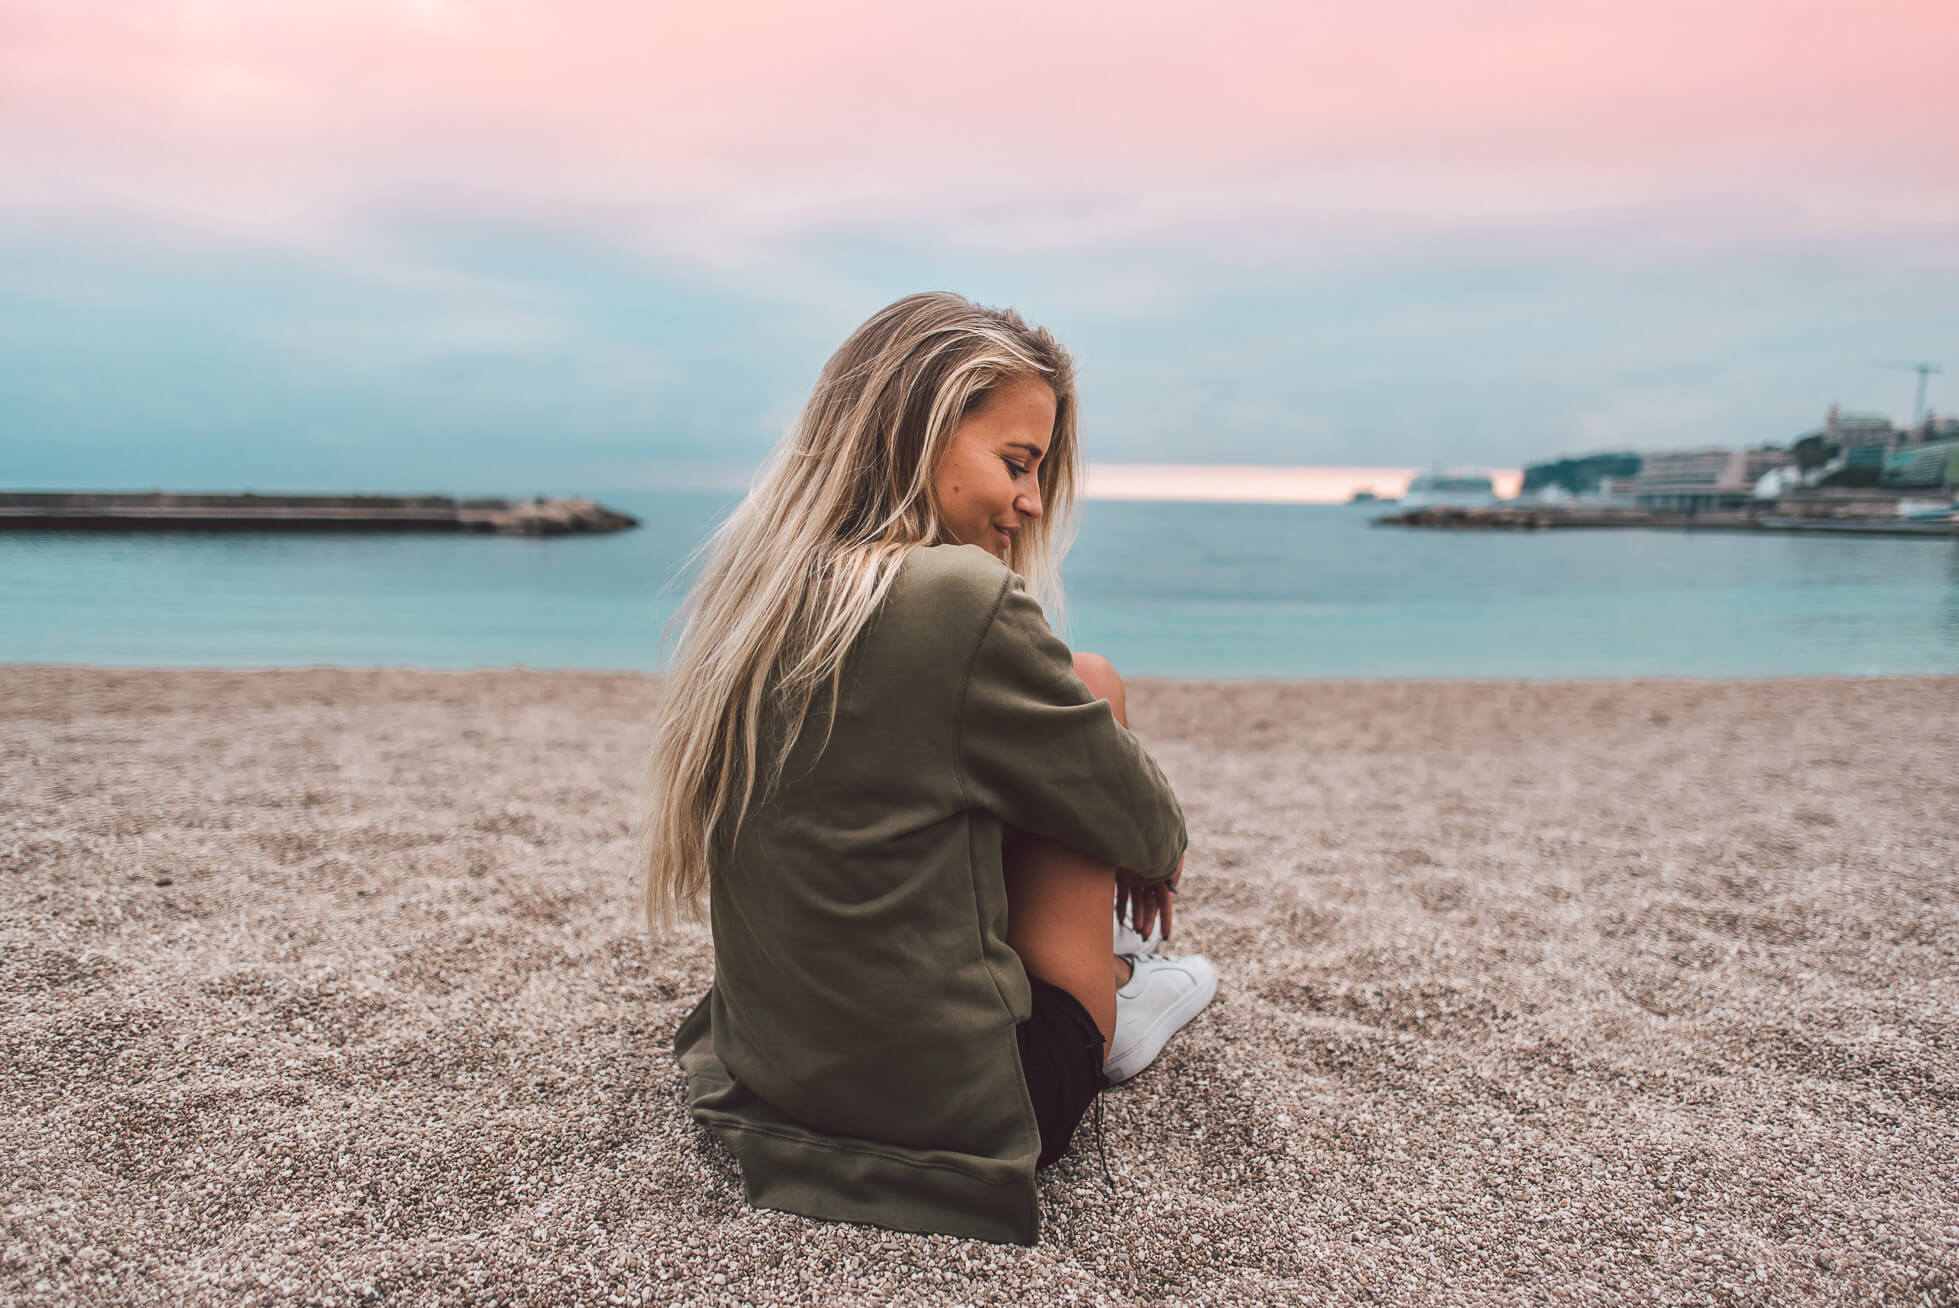 janni-deler-beachy-moment-sunsetDSC_6979